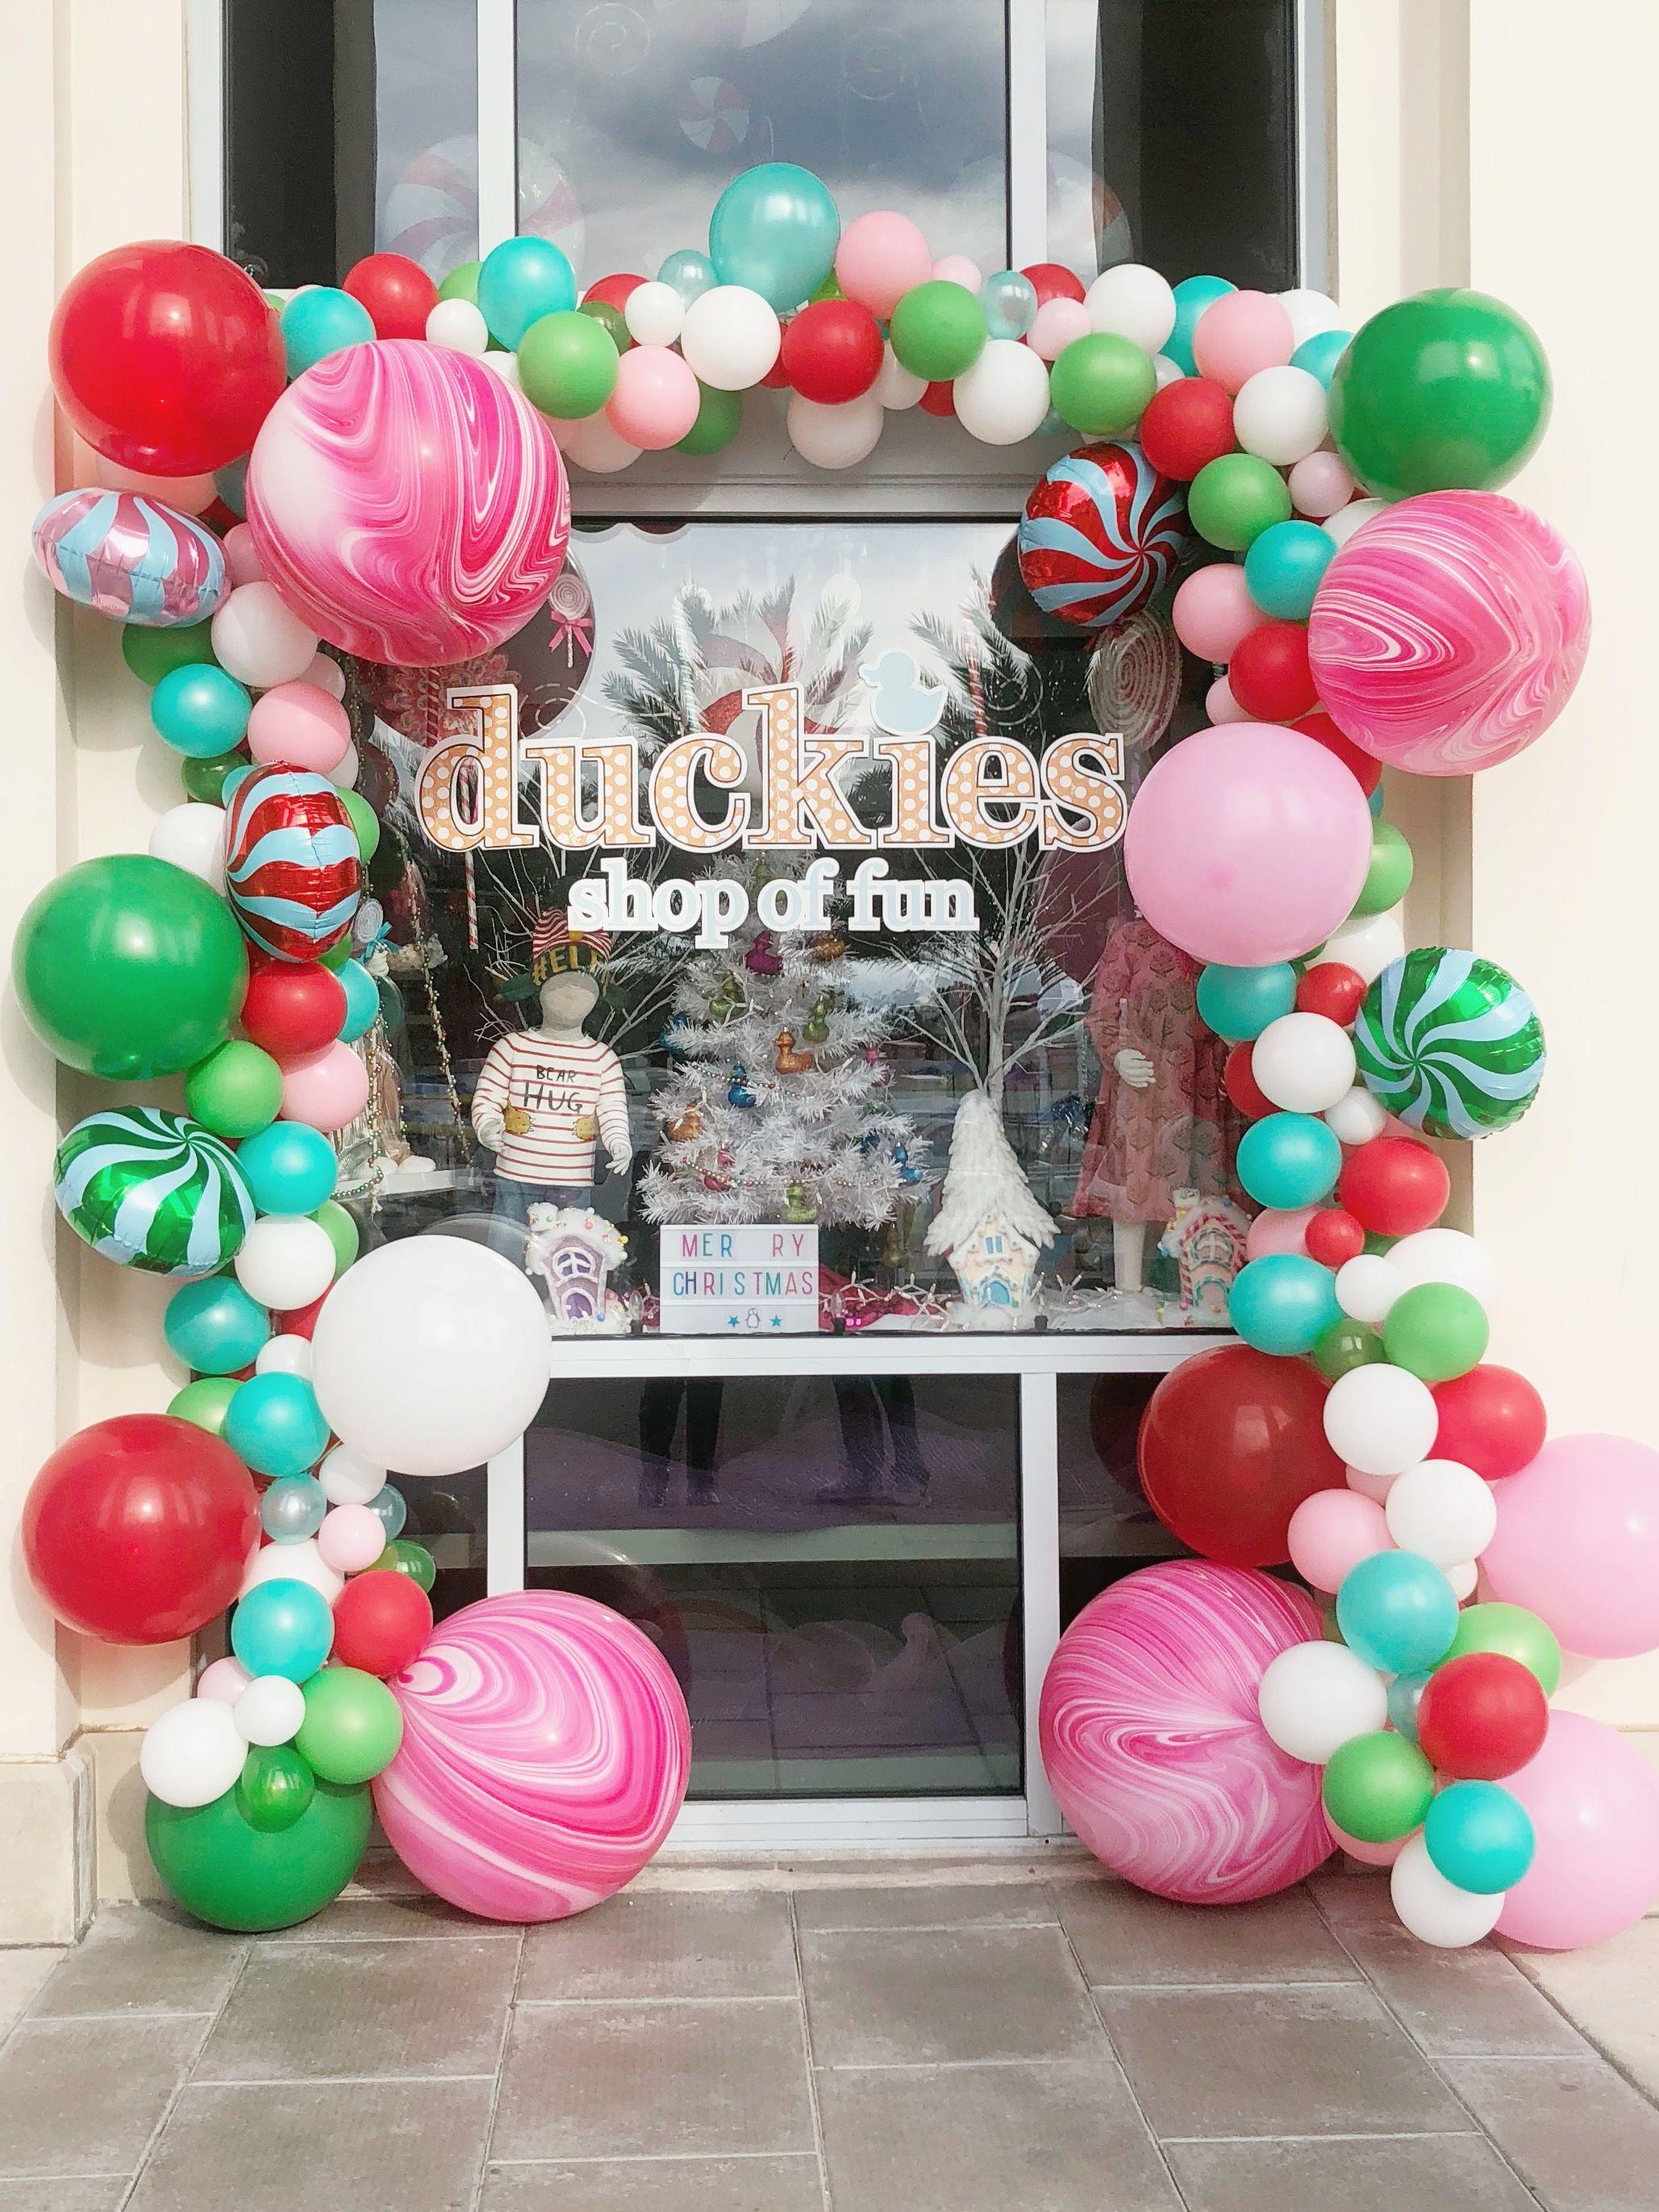 Pin By Mingle On Balloons Christmas Balloons Halloween